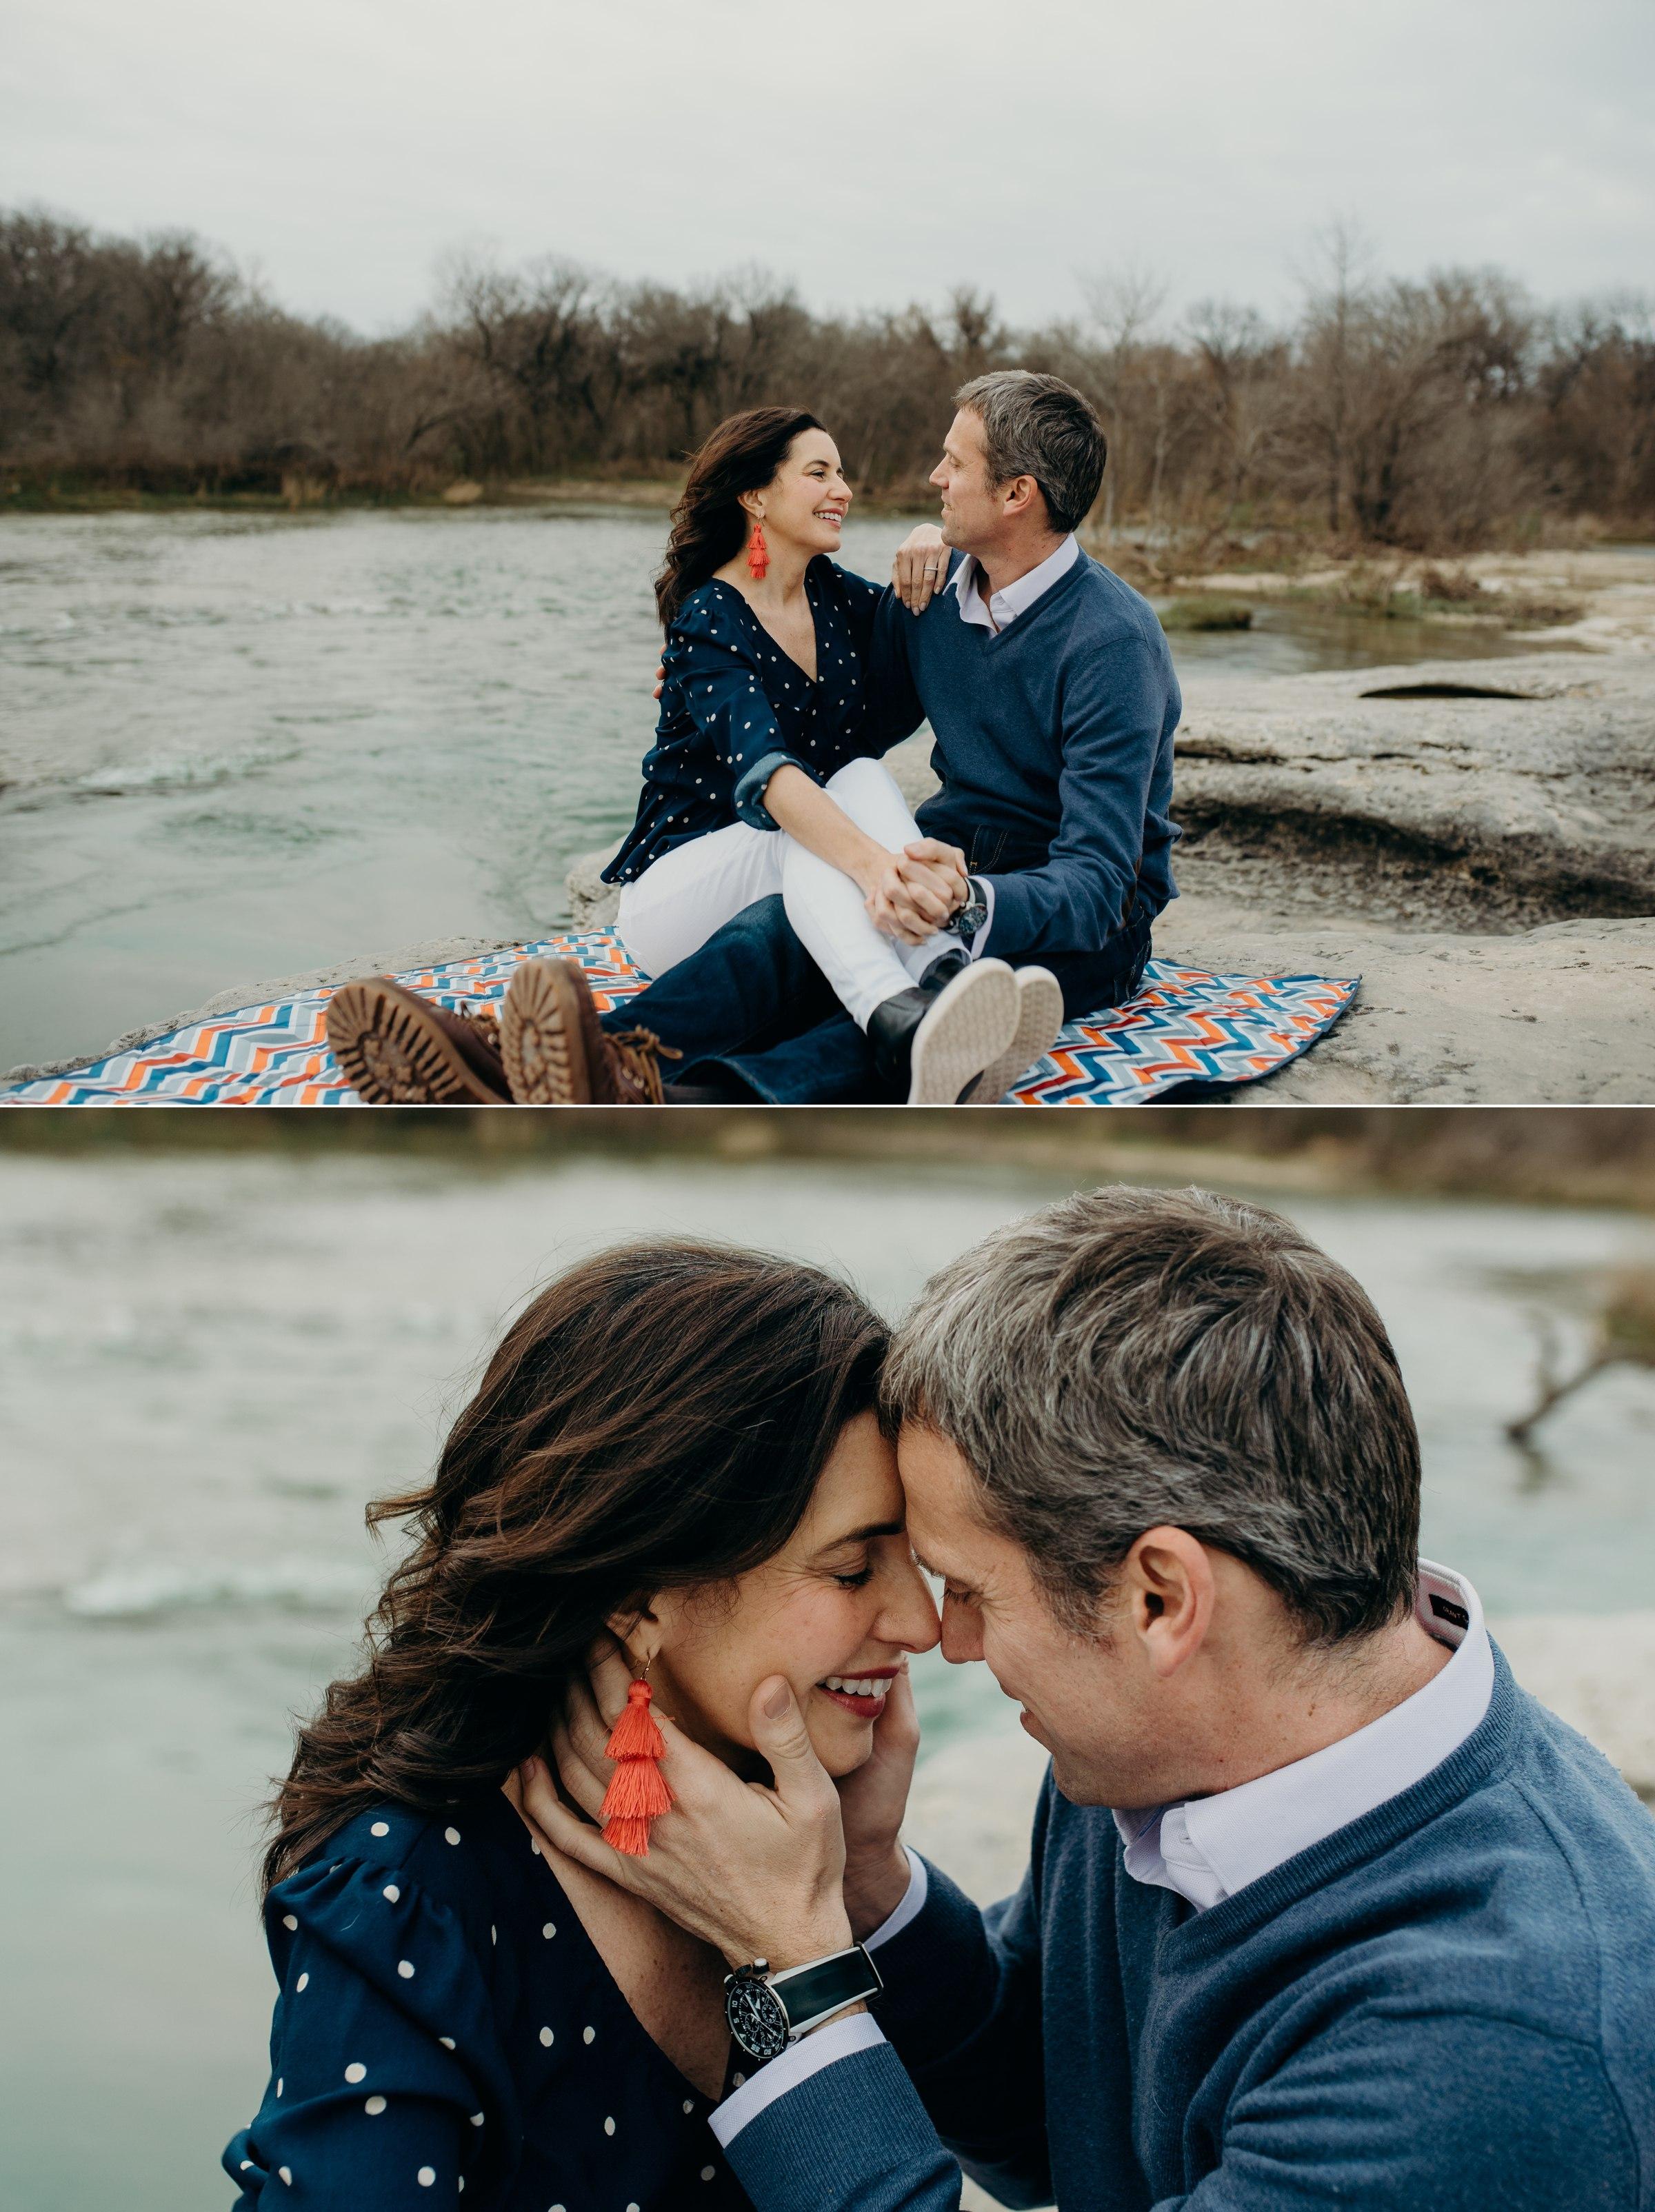 austin-mckinney-falls-engagement-photographer-elopement-prices-best-headshot-senior-adventurous-italy-minneapolis-texas-minnesota-dallas-houston-tulum-mexico_0020.jpg